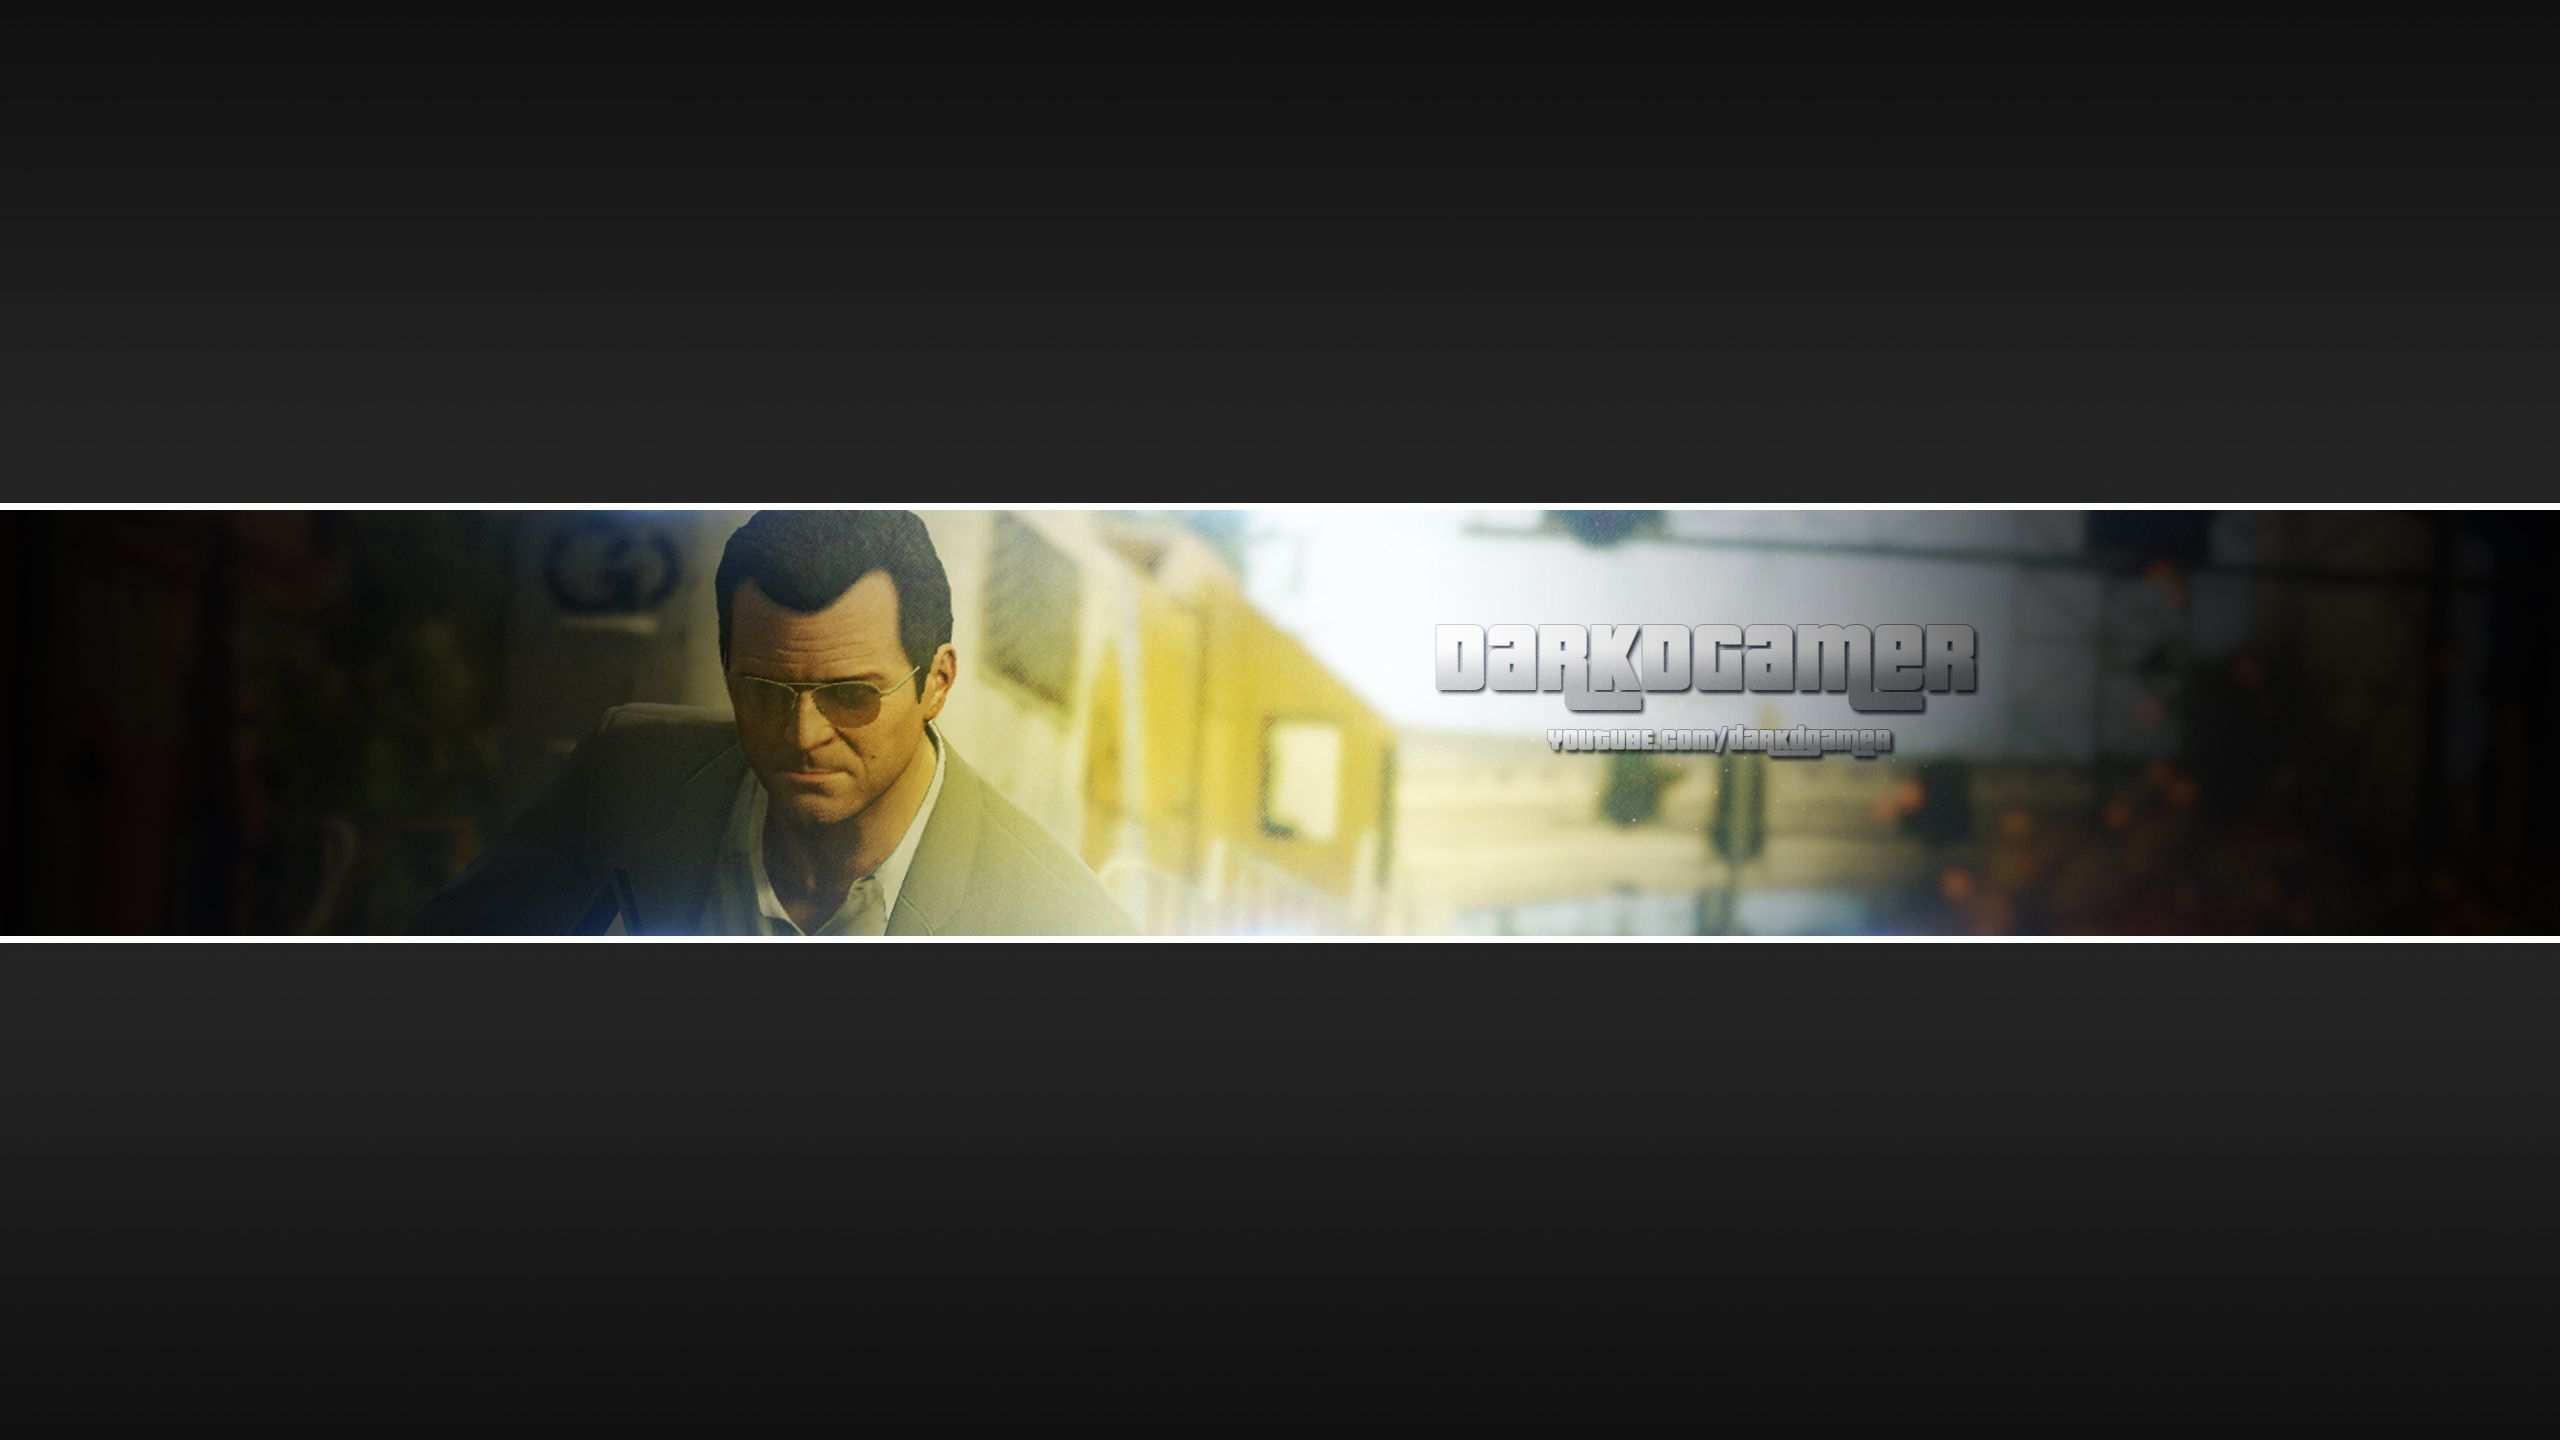 Gta 5 Youtube Banner